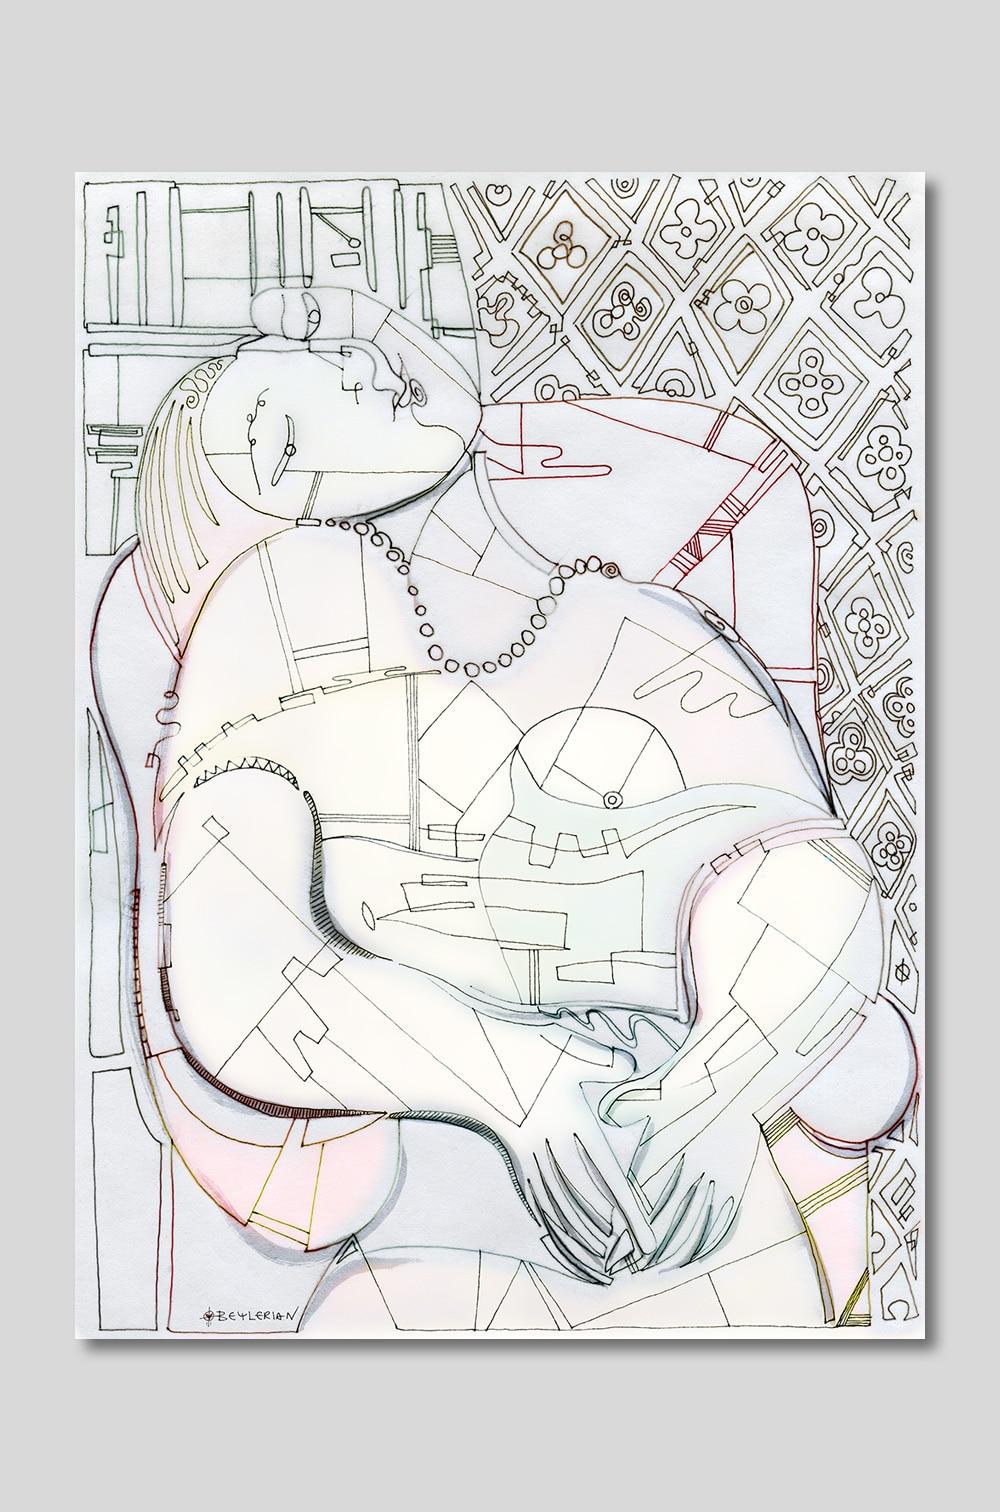 Picasso-Dream